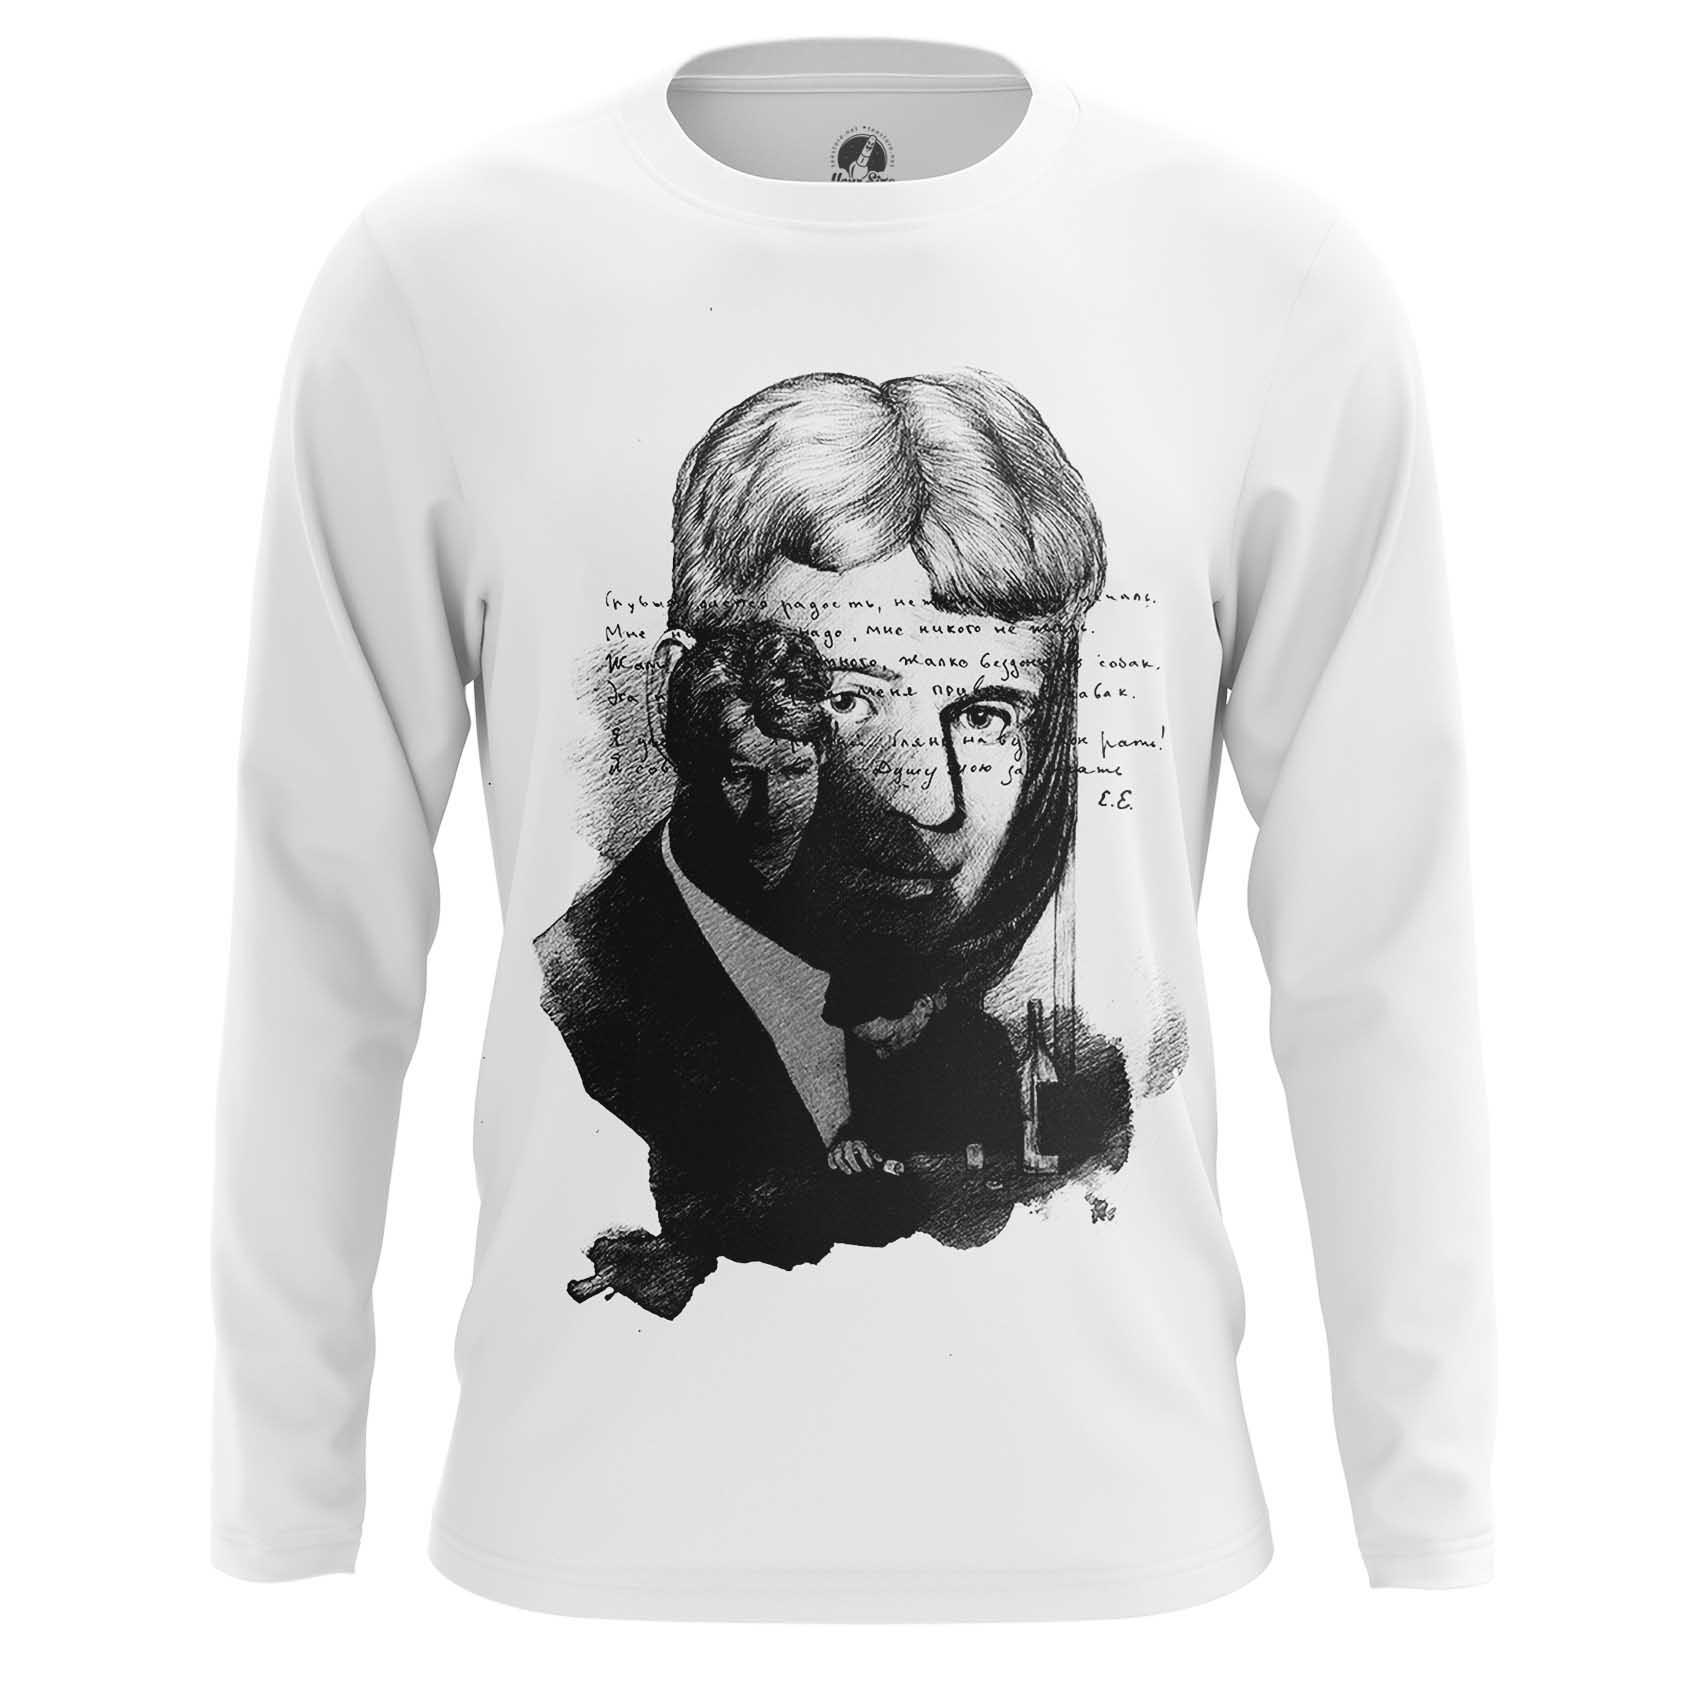 Merch Men'S T-Shirt Sergei Yesenin Black White Paint Cloth Top